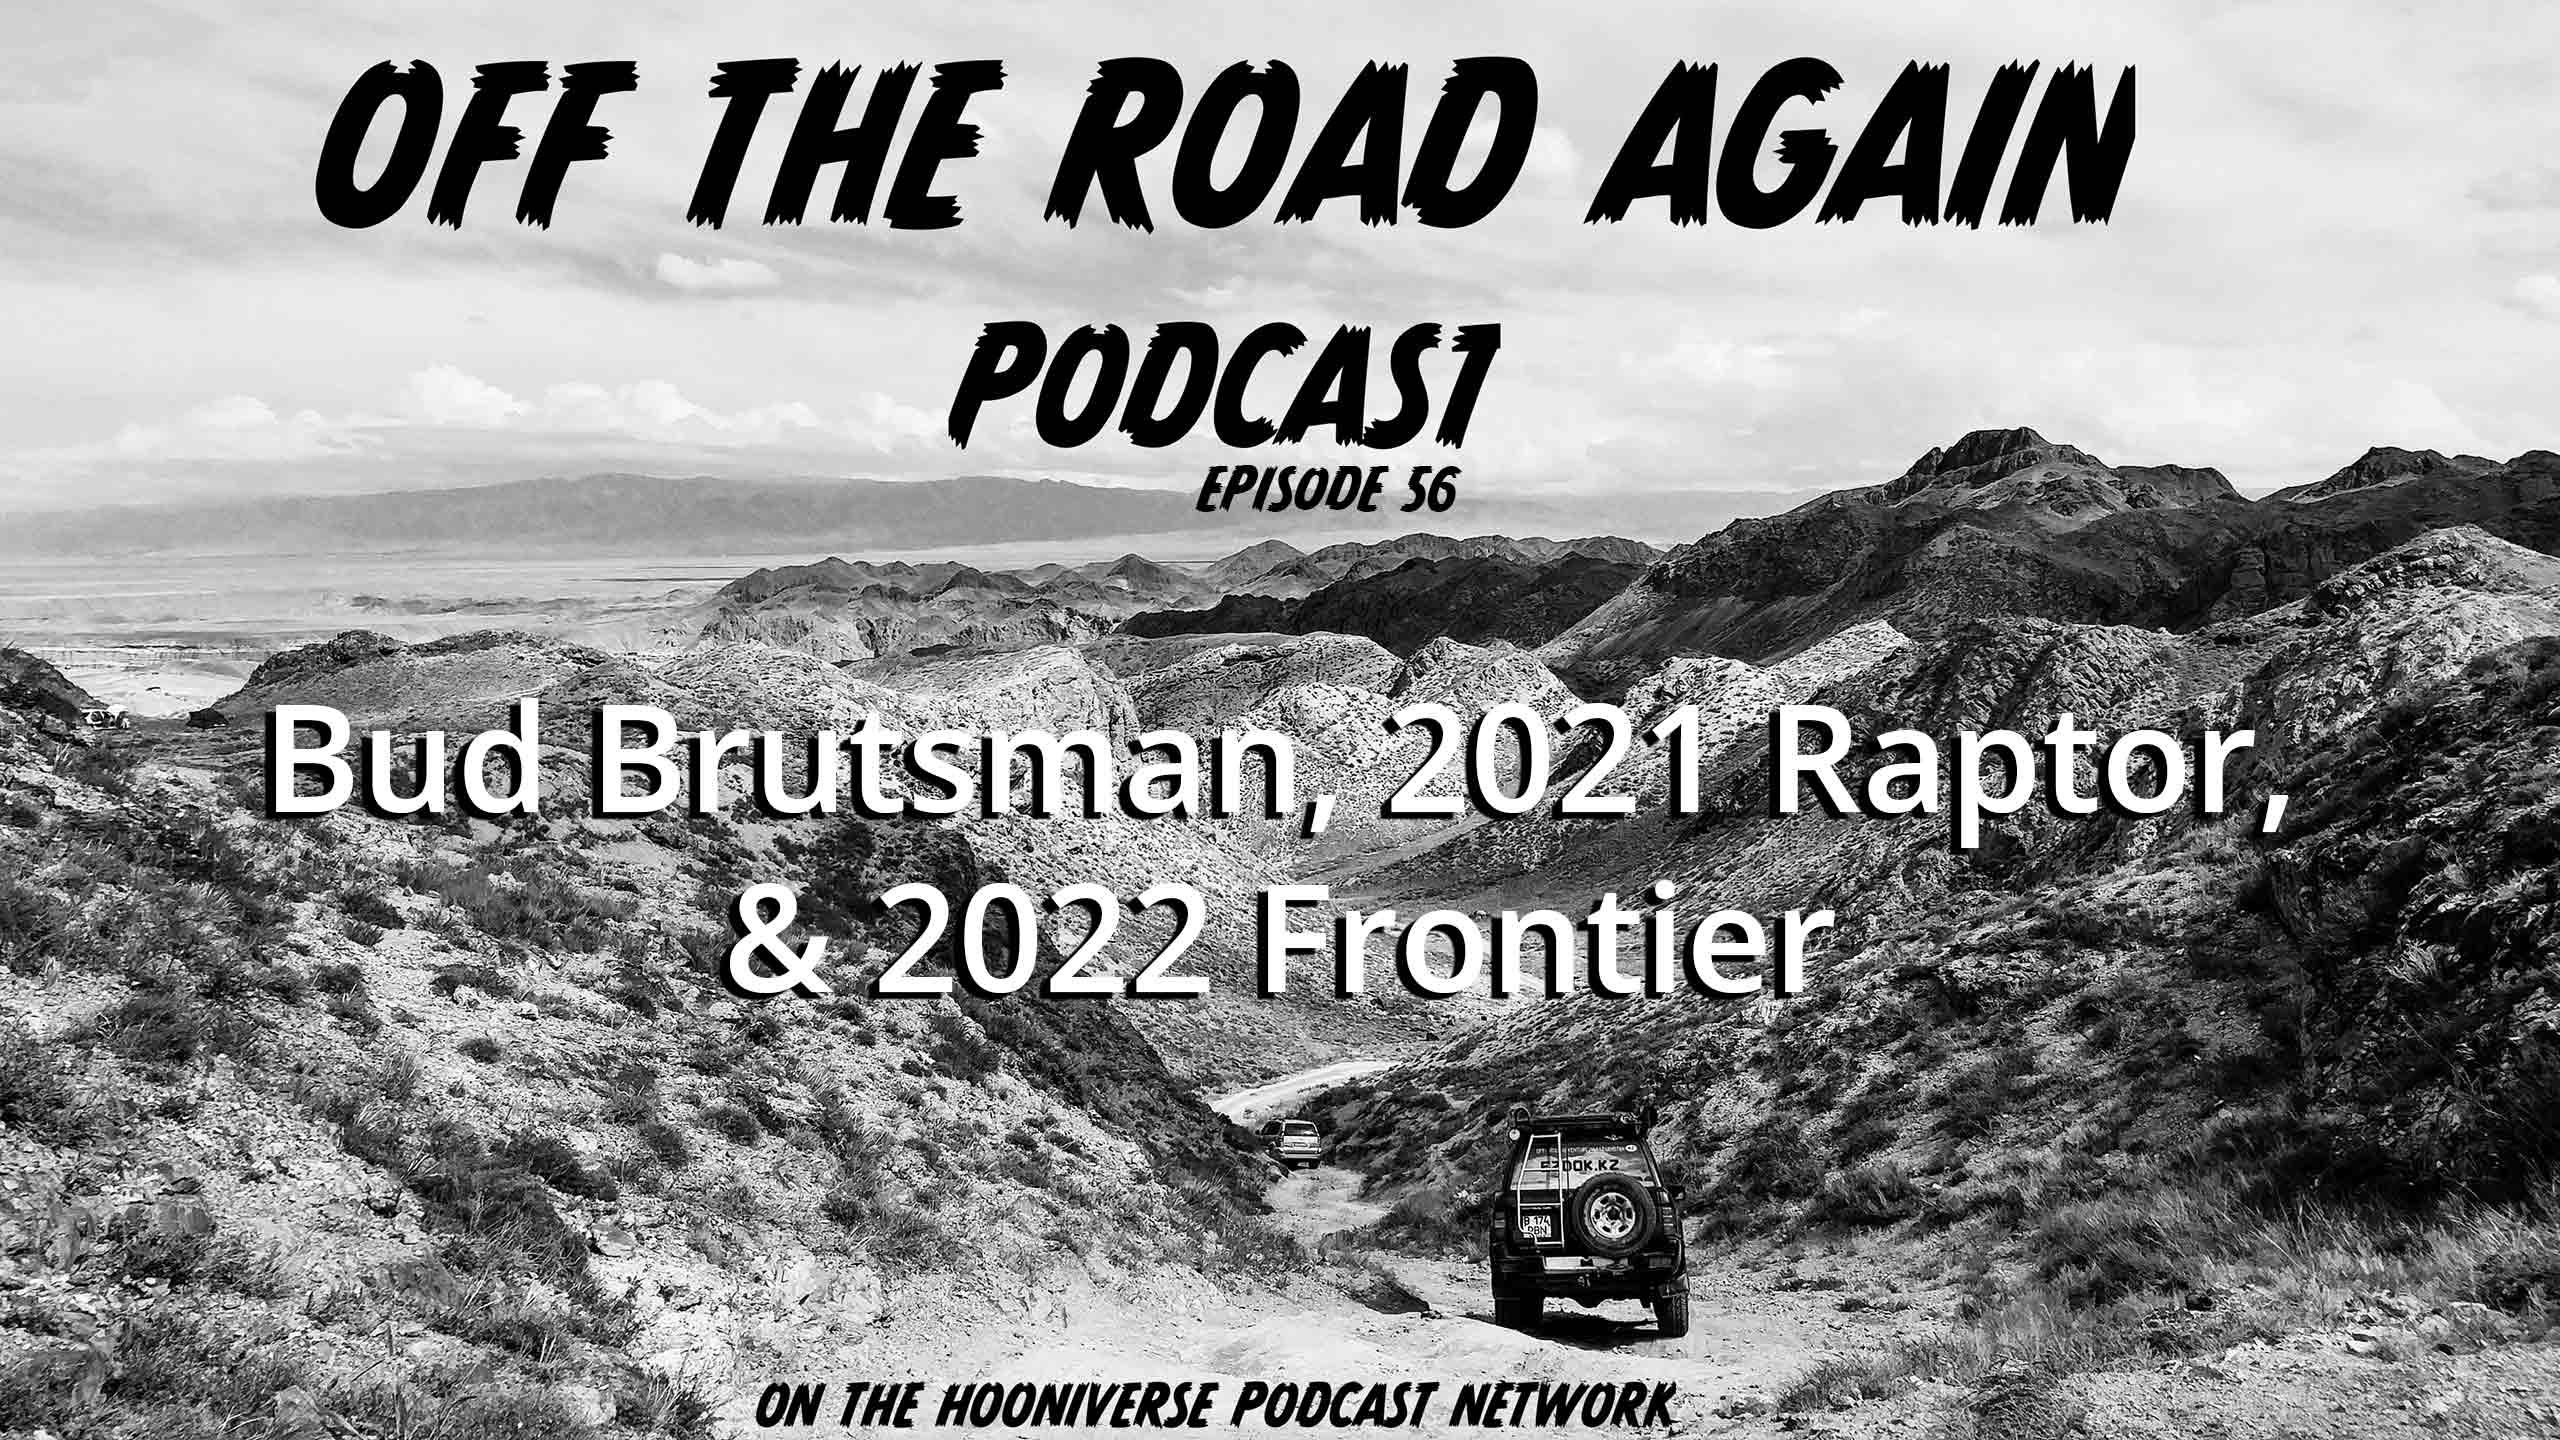 2021-Ford-Raptor-2022-Nissan-Frontier-Bud-Brutsman-Off-The-Road-Again-Podcast-Episode-56